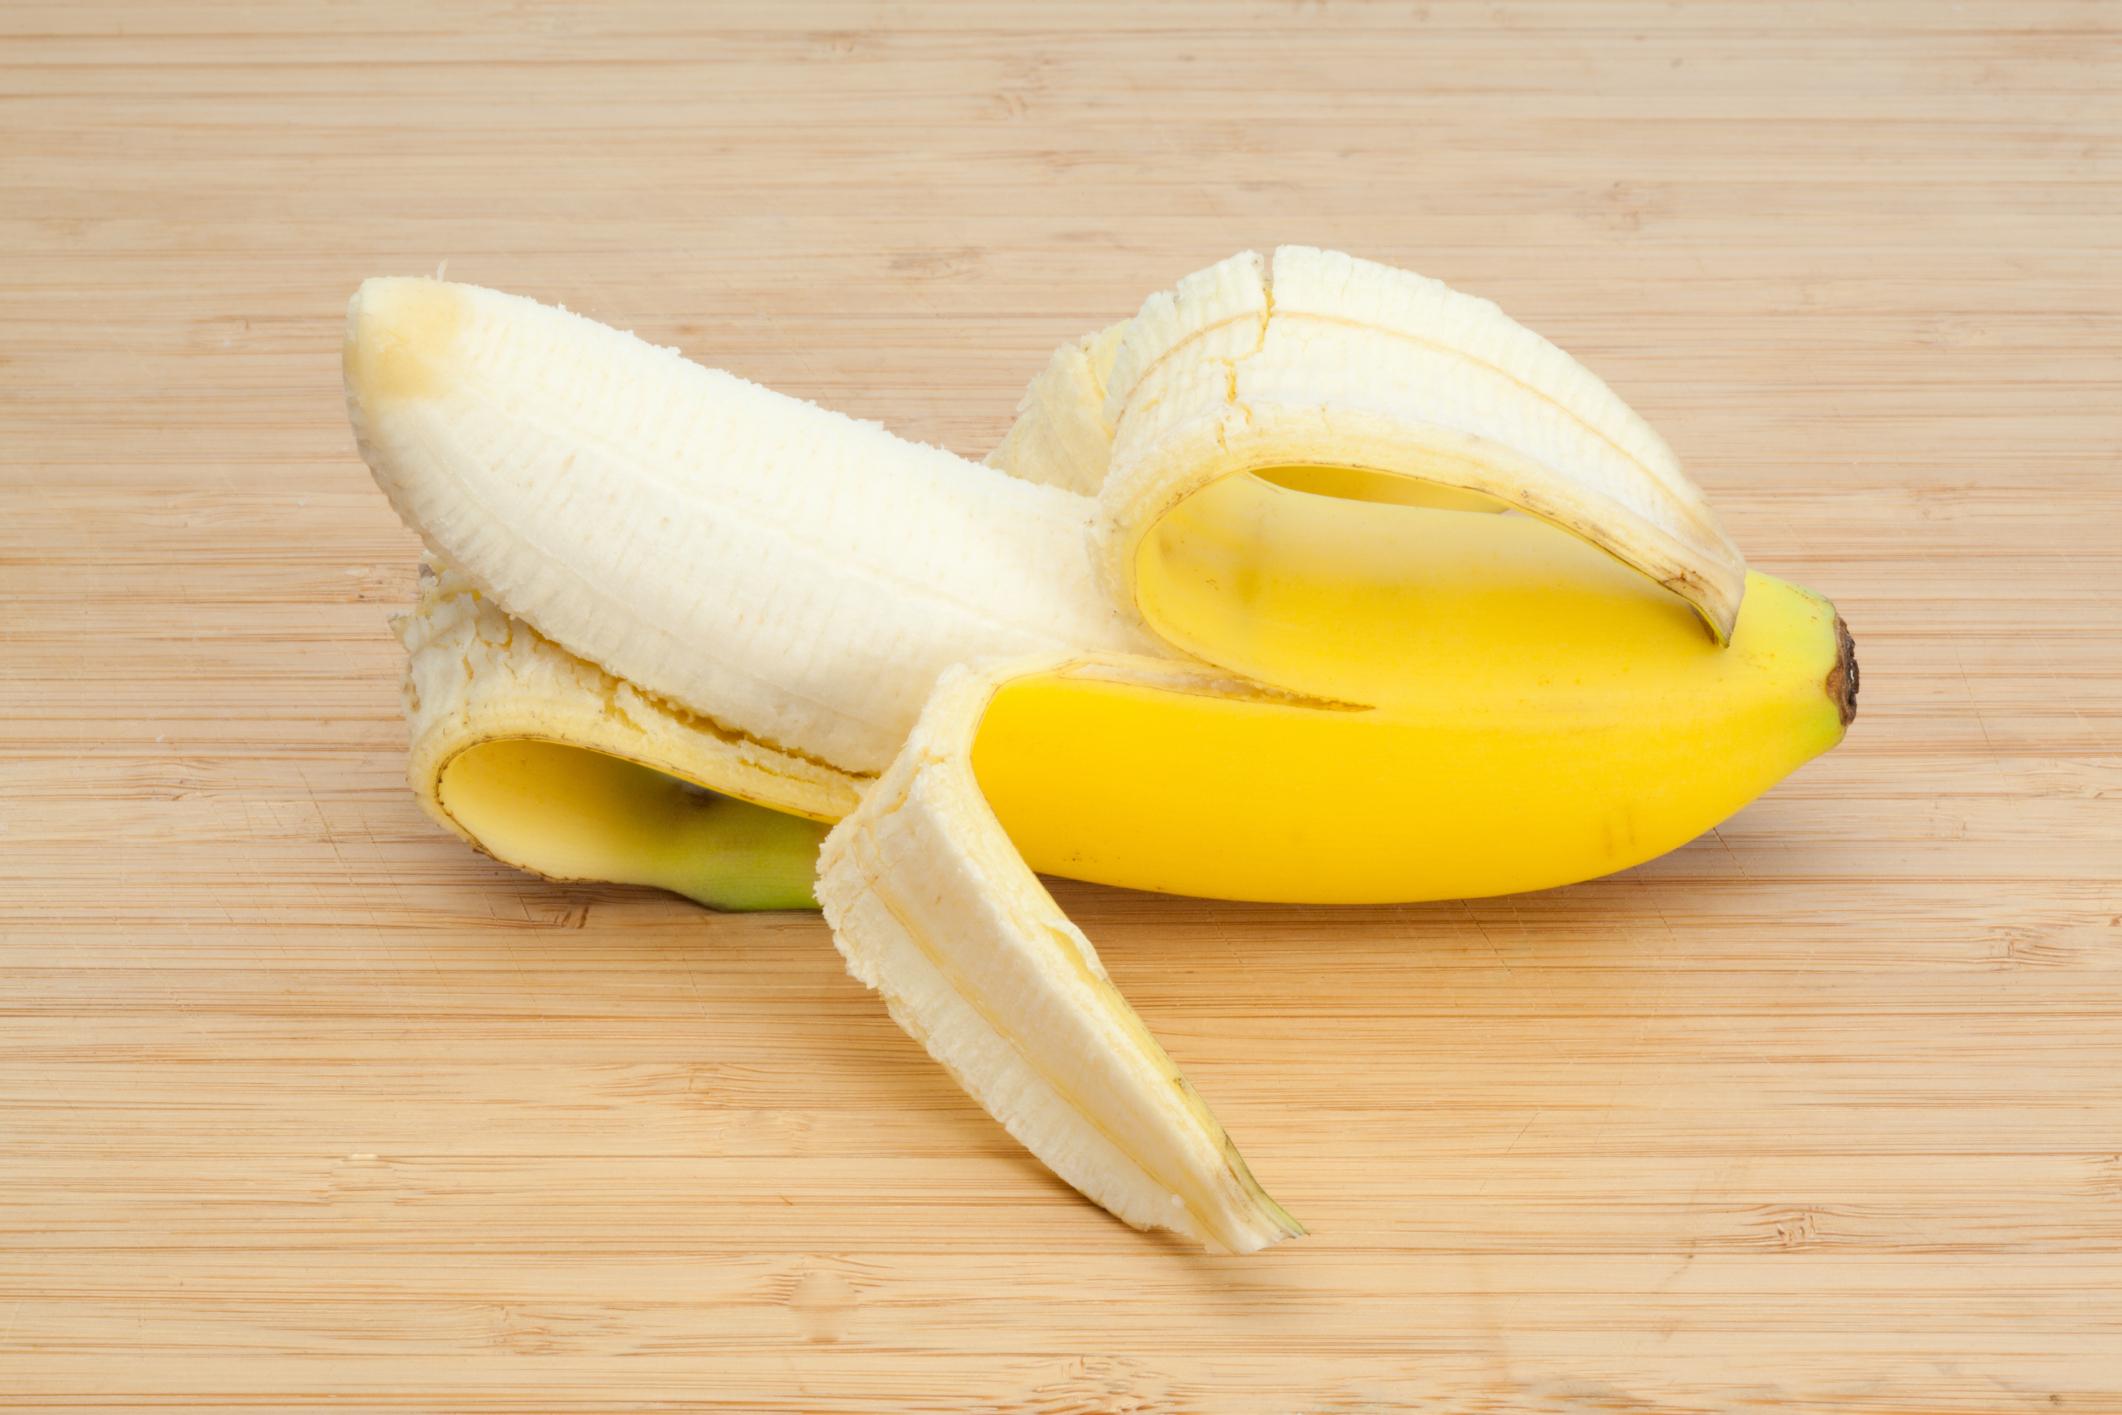 How many kcal in a banana Calorie banana. The nutritional value of bananas 72